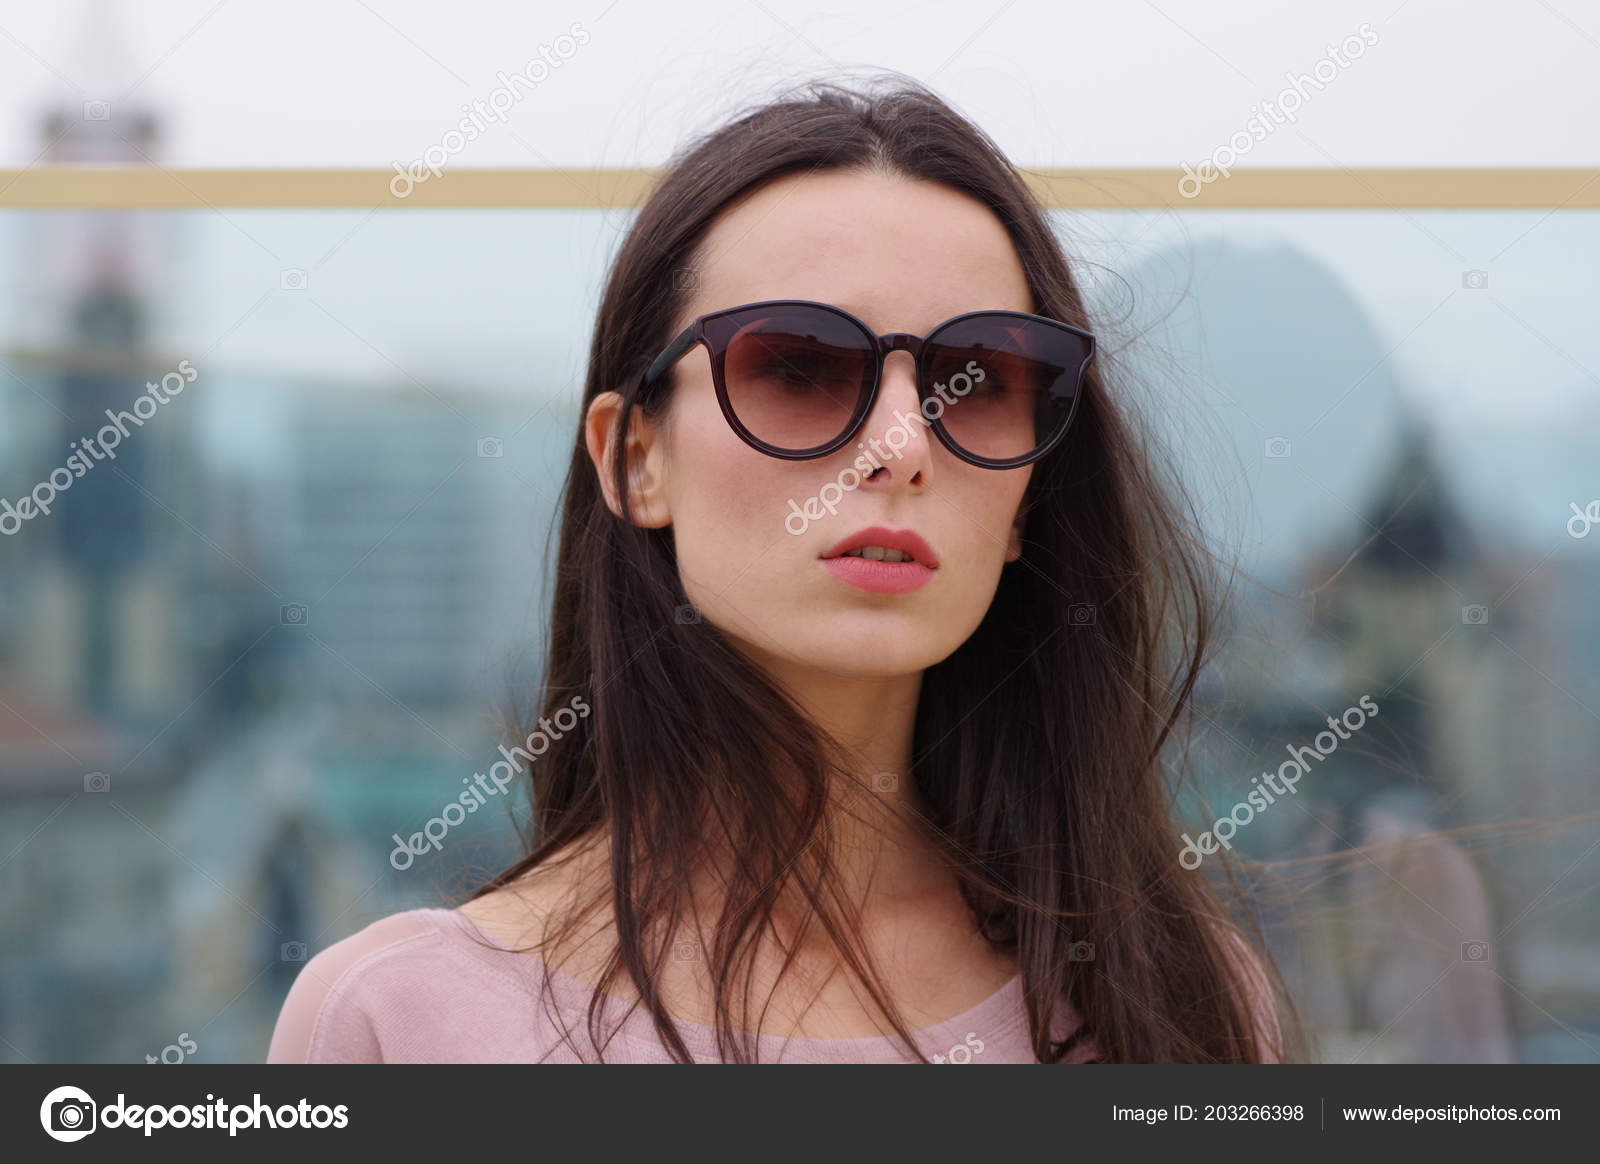 0ed4dd6698 Μακρυμάλλης μελαχρινή γυναίκα σε μεγάλα γυαλιά ηλίου — Φωτογραφία Αρχείου